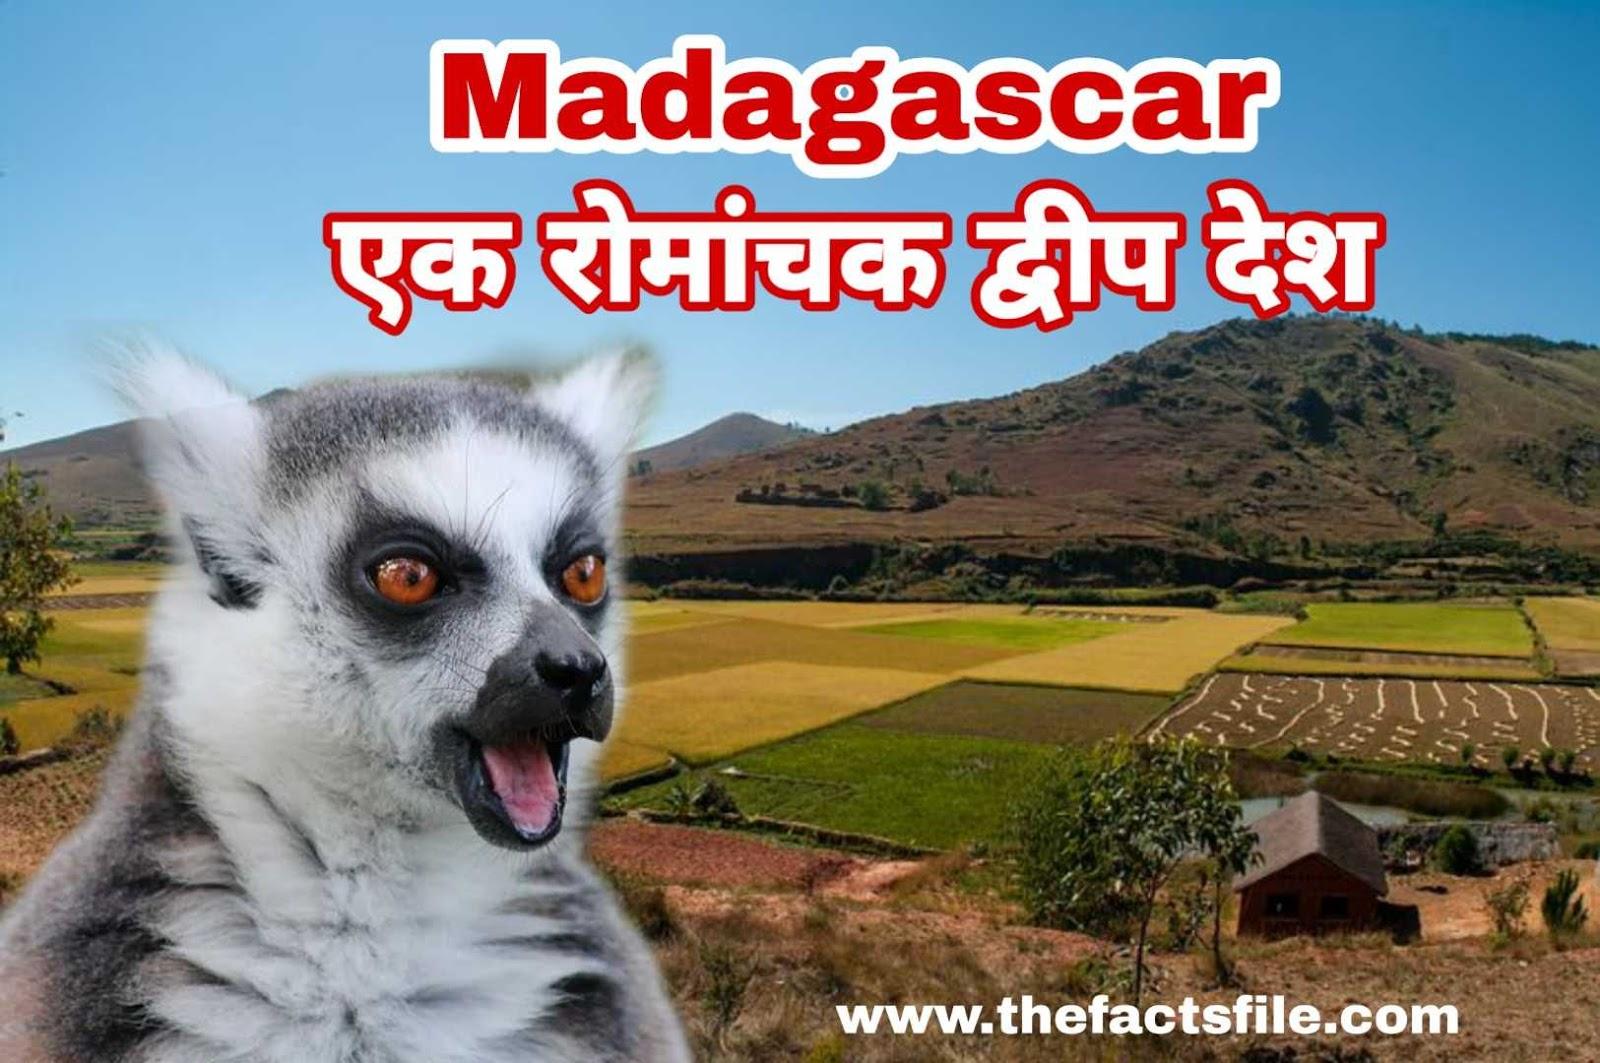 Amazing Facts about Madagascar in Hindi - मेडागास्कर के बारे में रोचक तथ्य